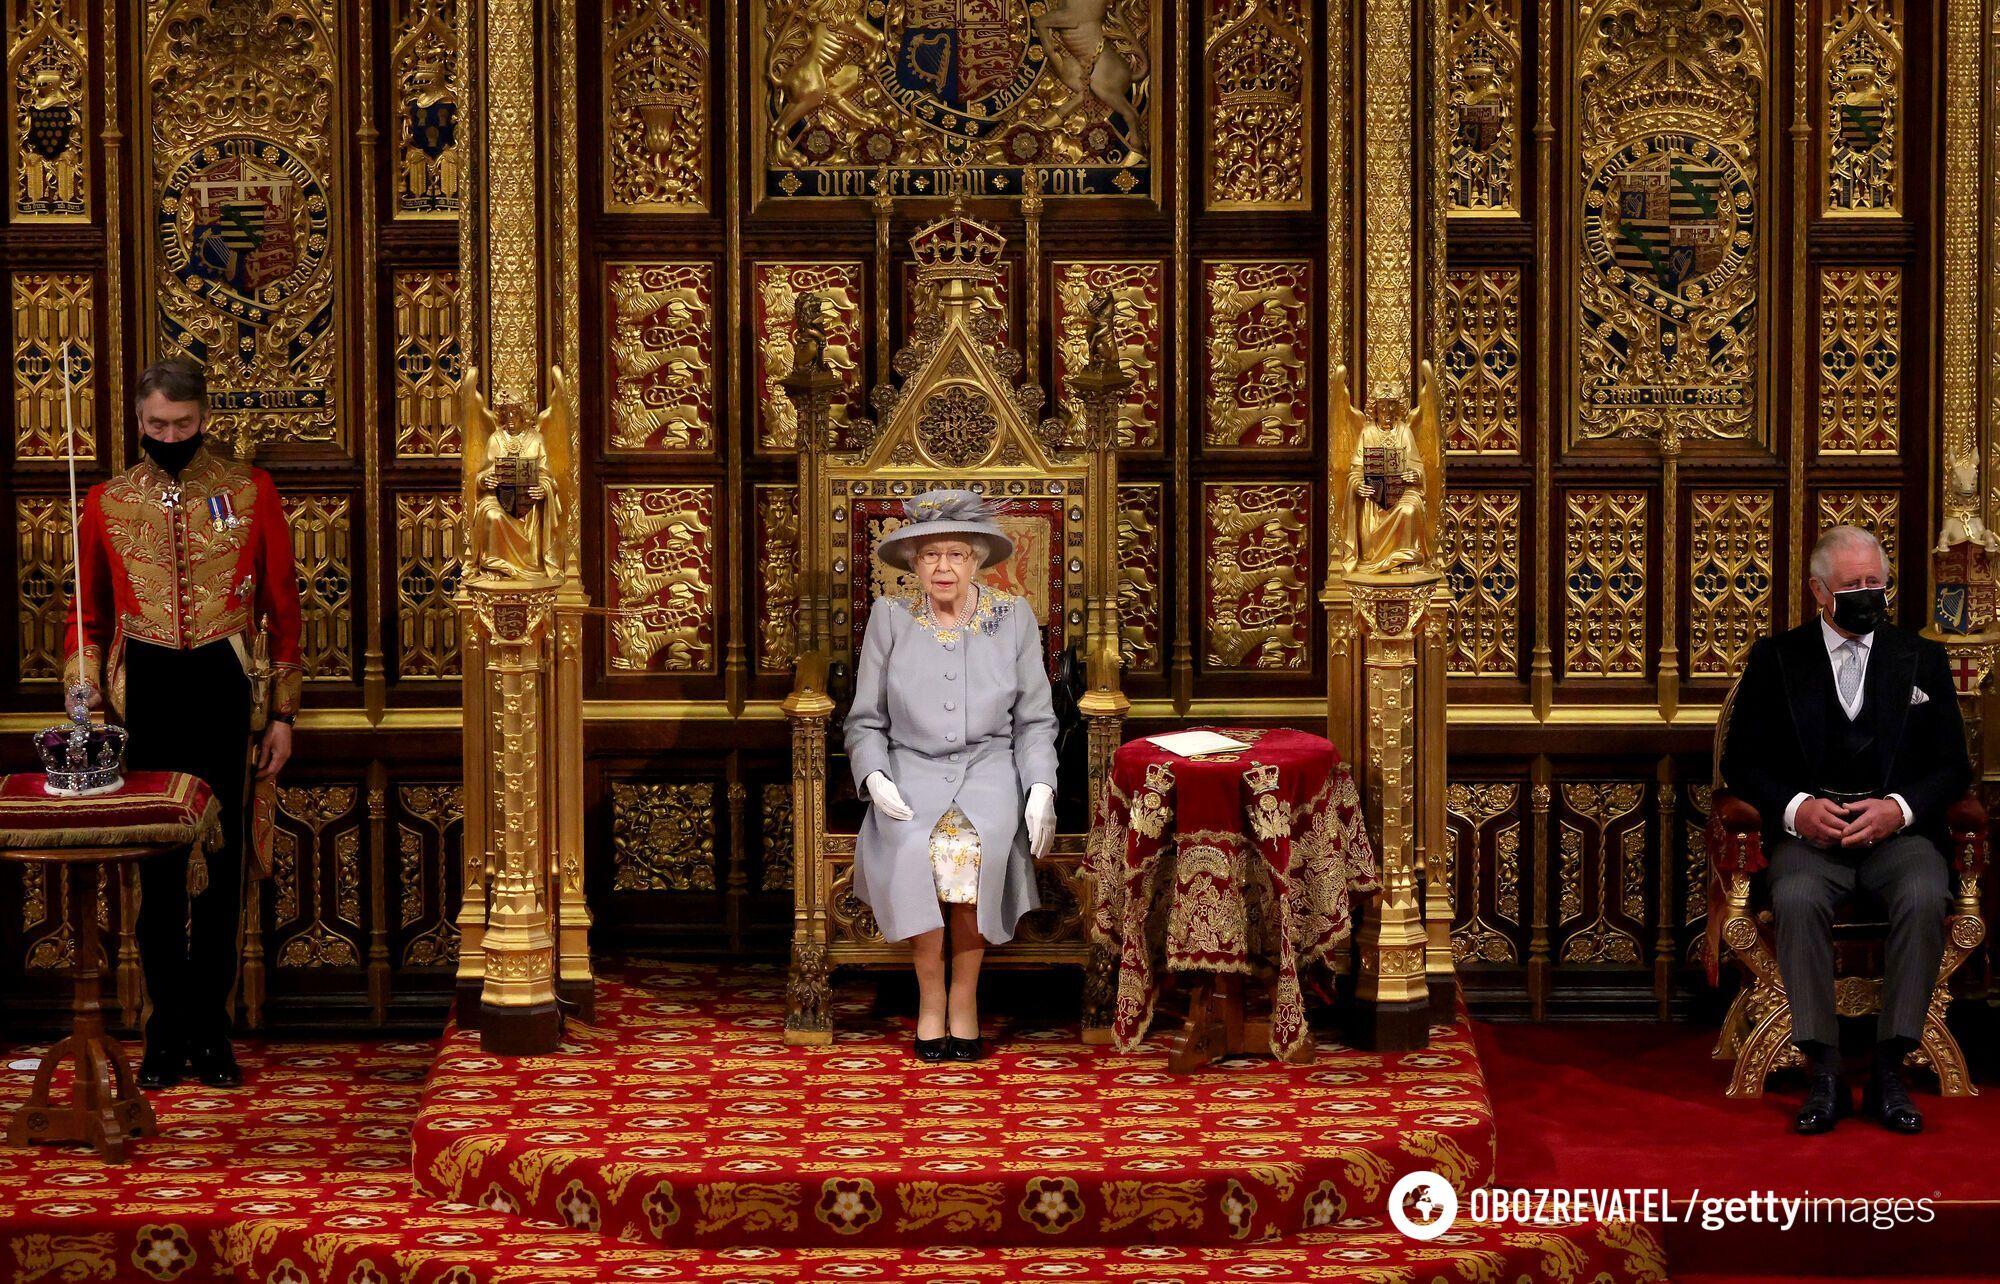 Королева не надела символ ее власти – корону, которая весит почти килограмм